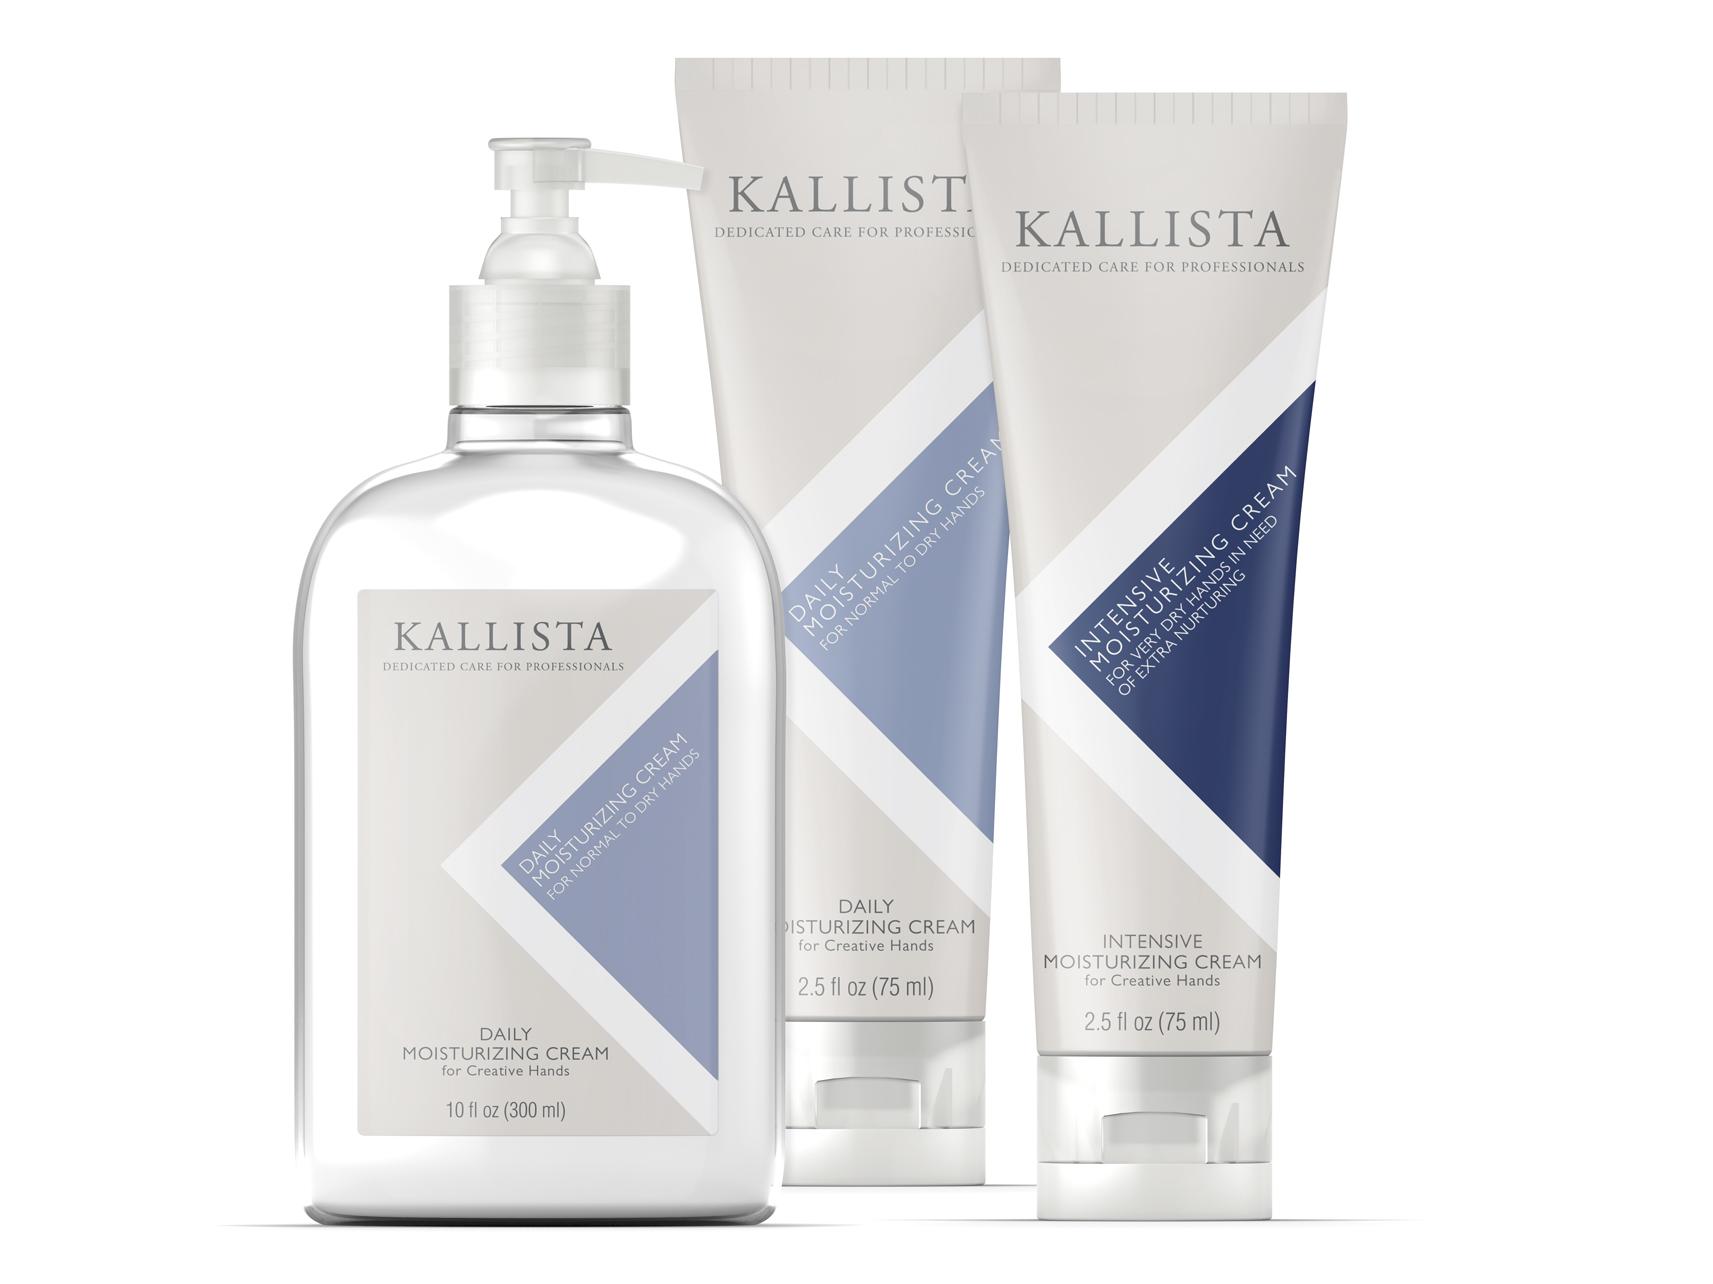 Kallista Beauty for Salon Pros Opens Distribution